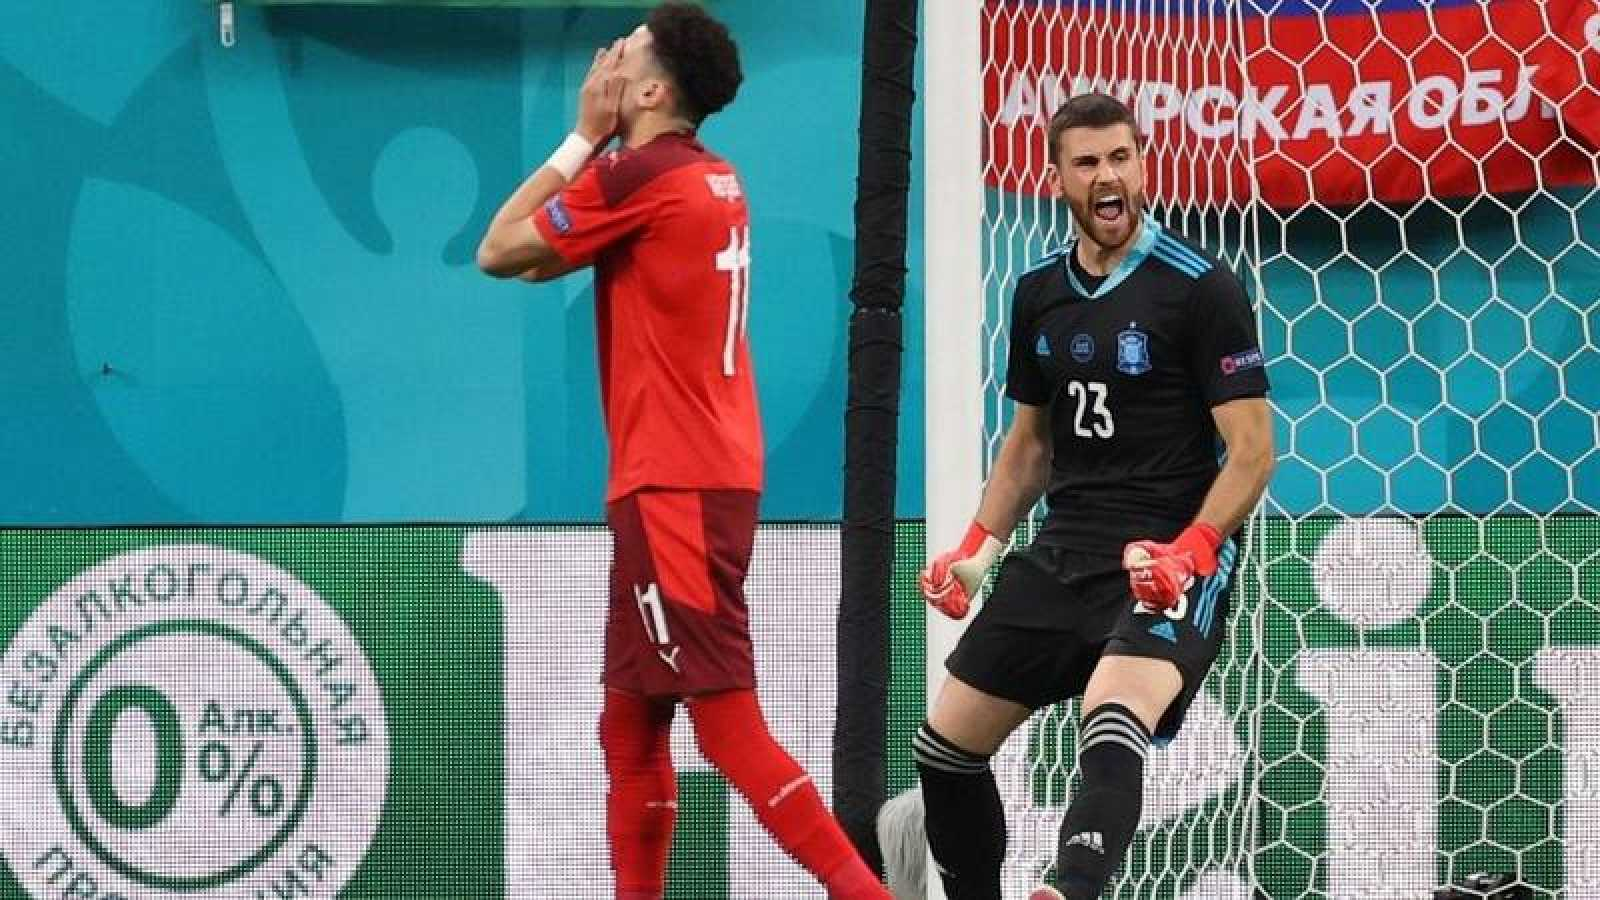 España pasa por penaltis y se enfrentará a Italia. Dinamarca e Inglaterra, los otros semifinalistas